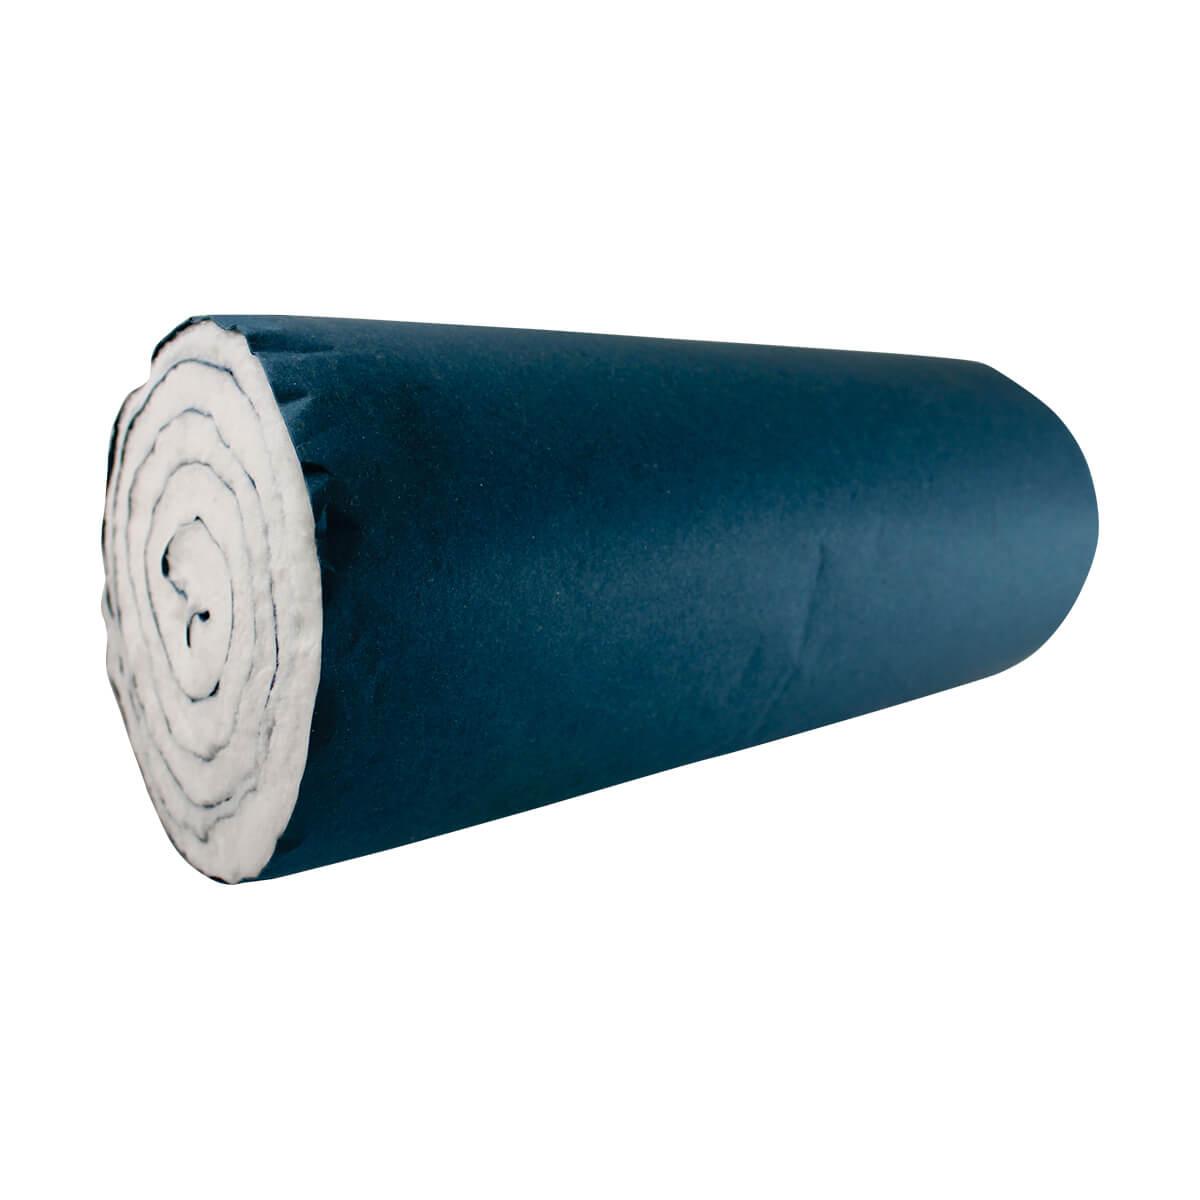 Cotton Roll Bandage